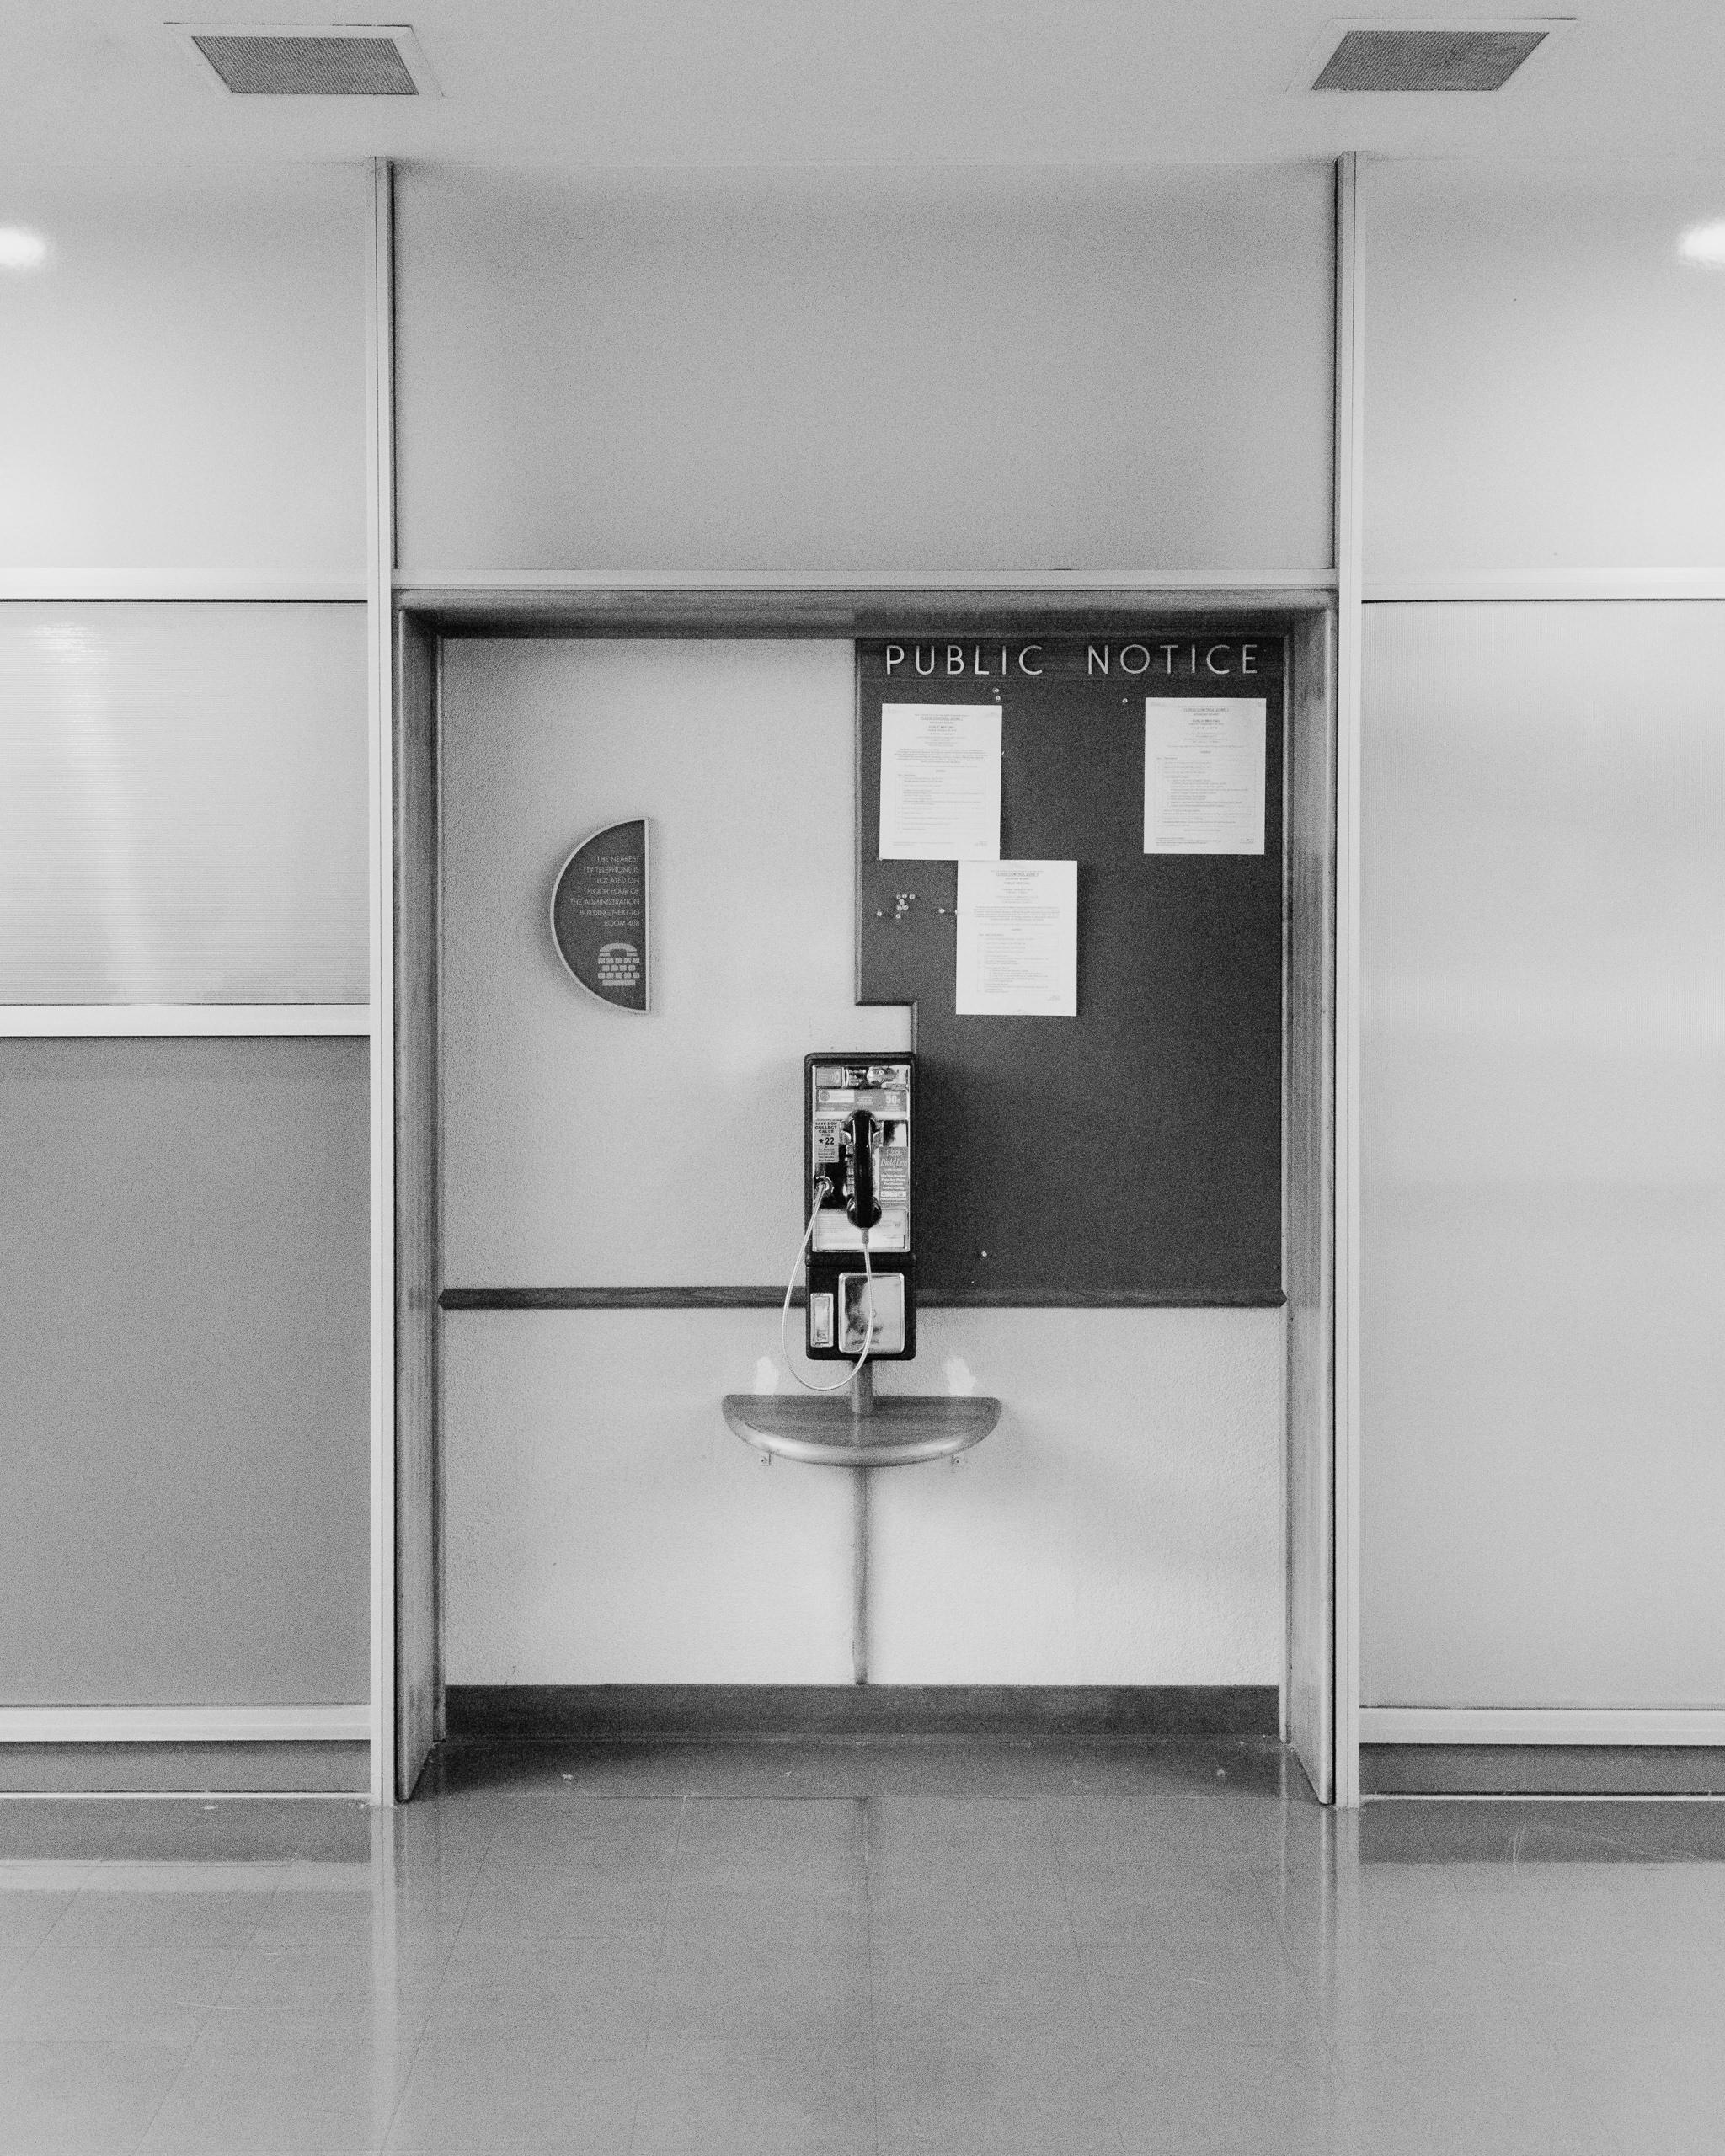 20190227 Marin Civic Centre - K M Dale Tan - 2213.jpg